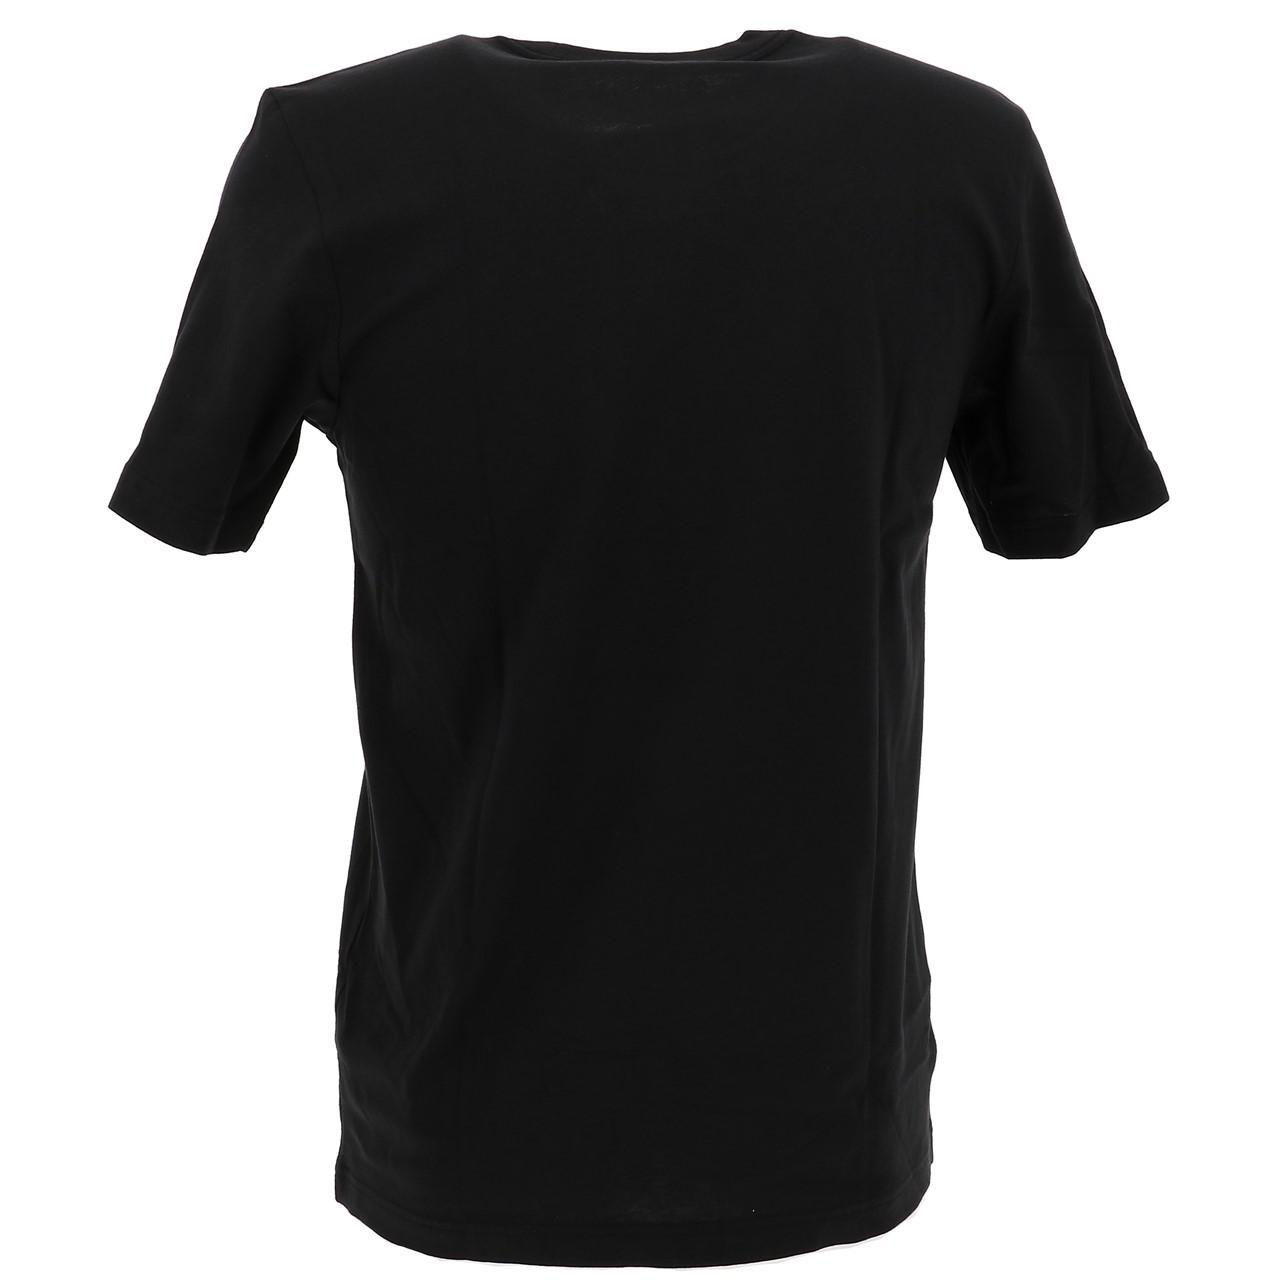 Short-Adidas-Brand-Black-Mc-Tee-Black-18283-New thumbnail 5